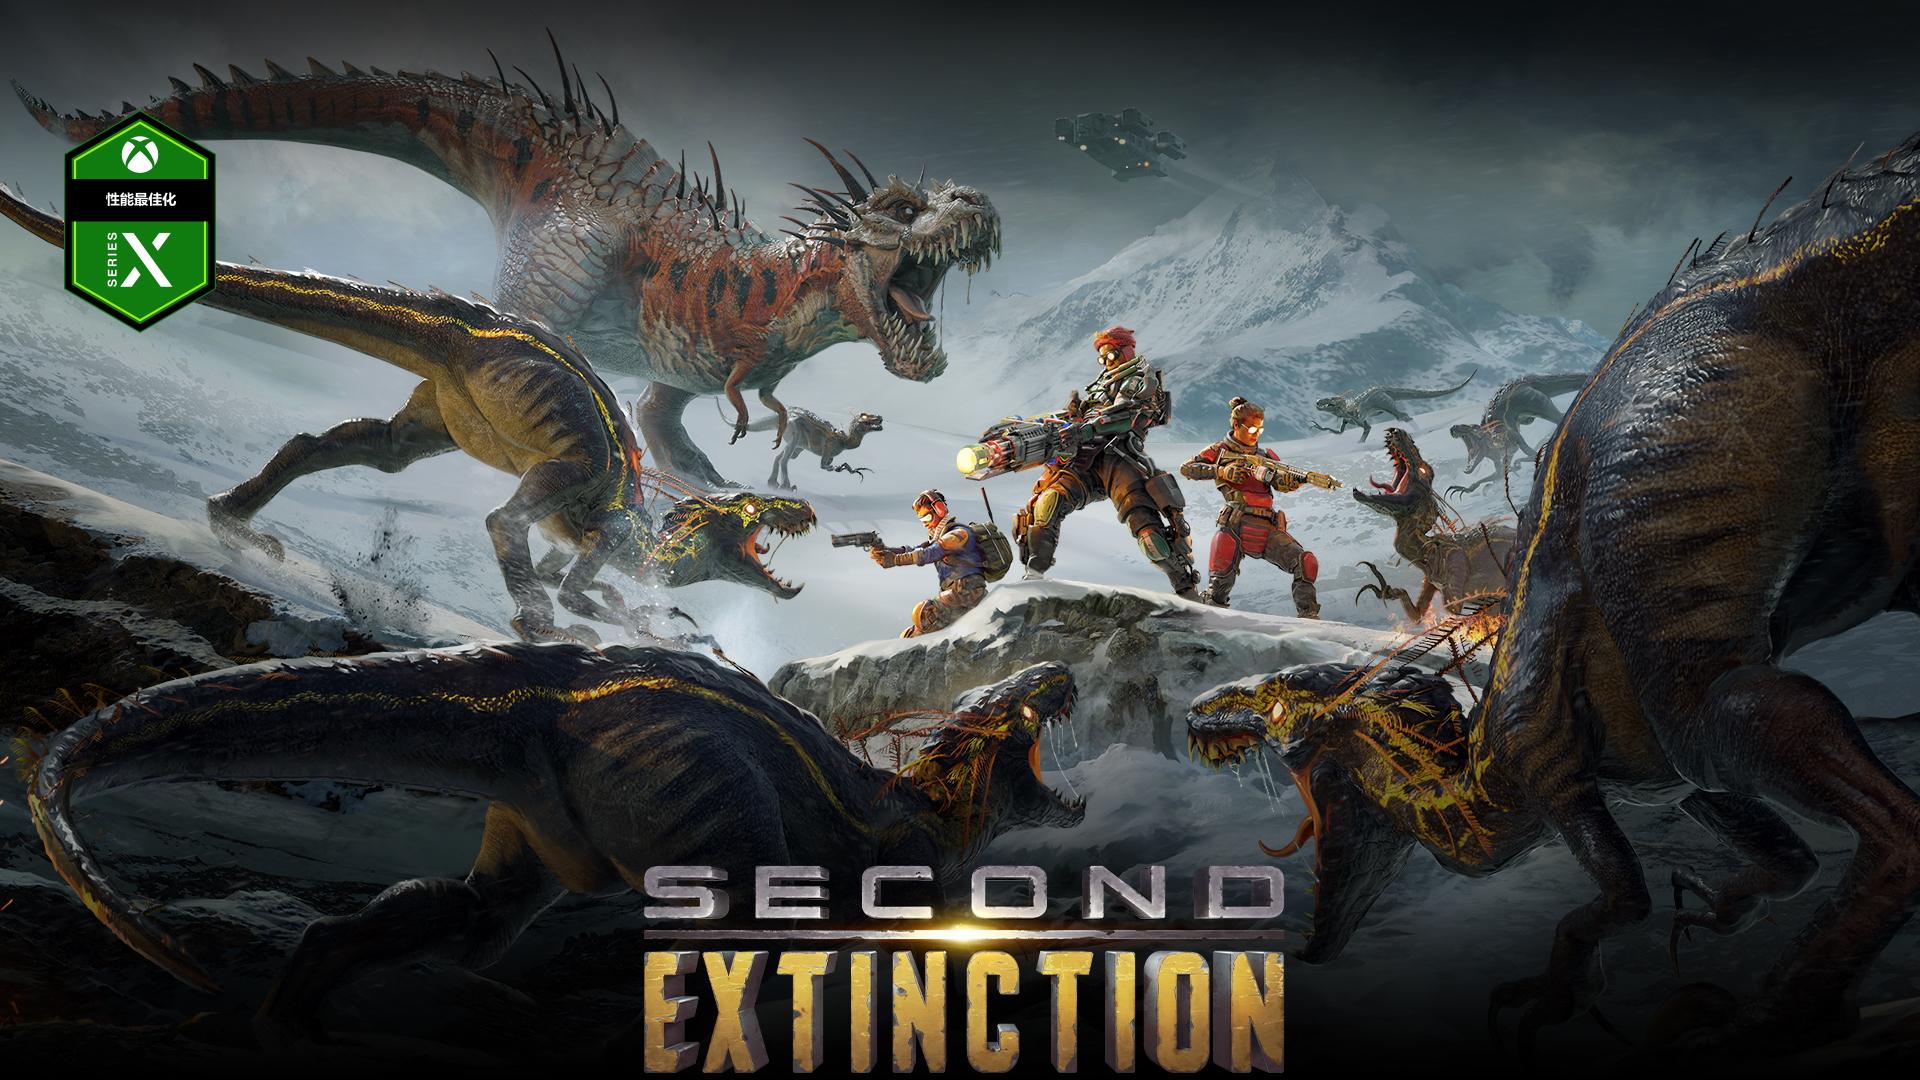 Second Extinction,Series X 性能最佳化,一群角色與一群恐龍對打。